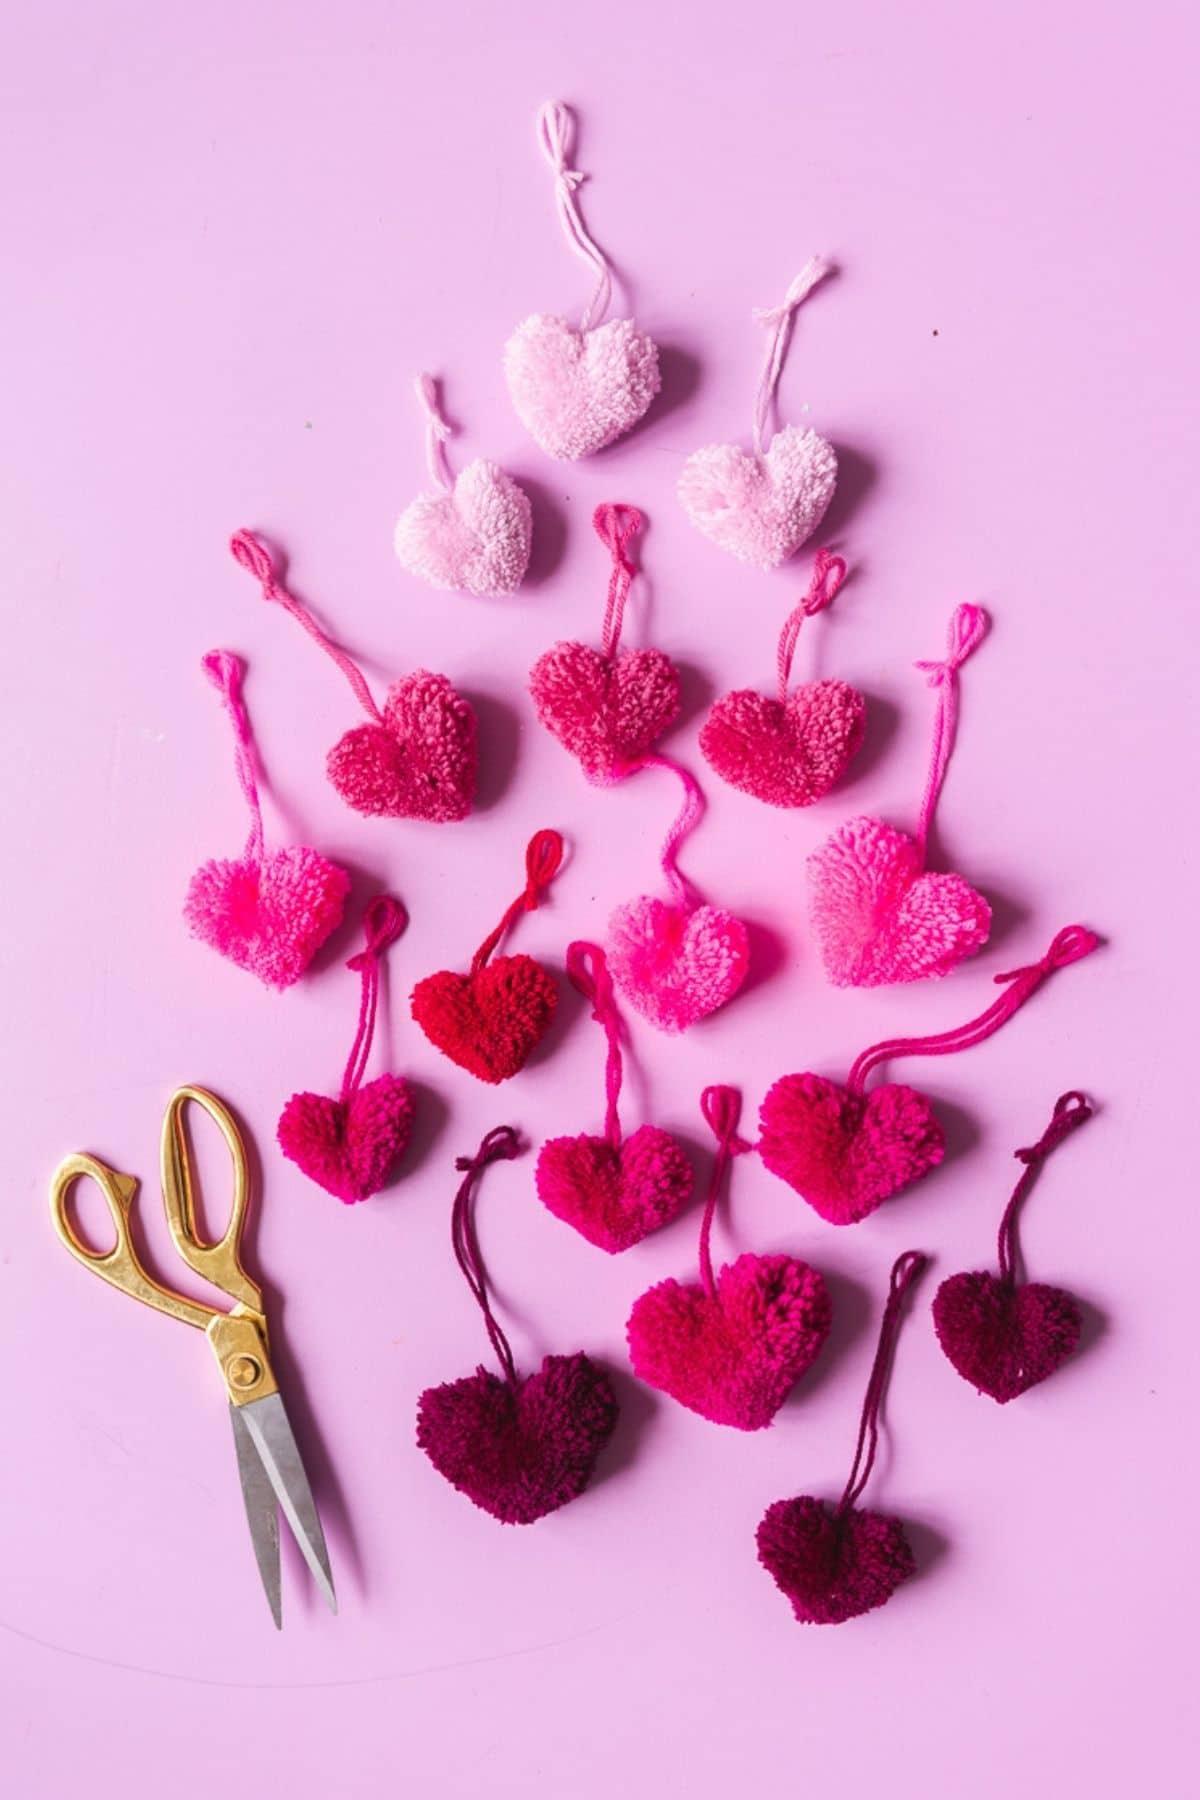 Heart pom poms